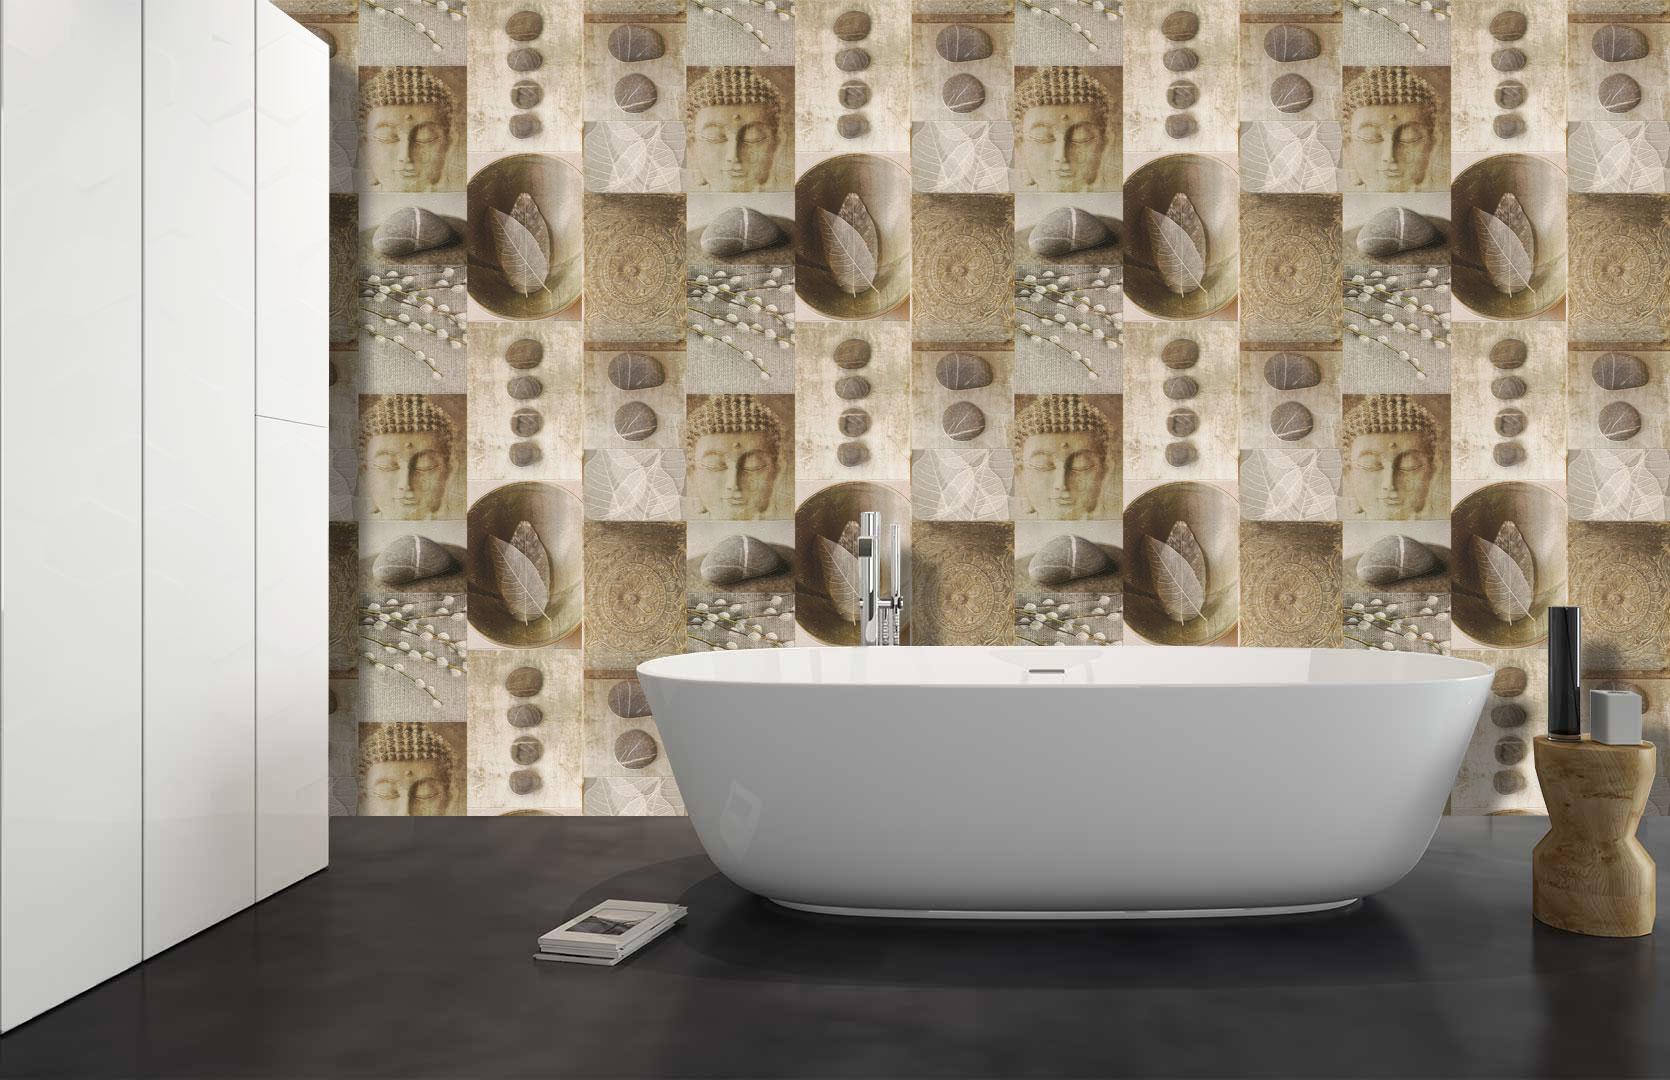 Kitchen Bathroom Buddha Tile Wallpaper Washable Vinyl Leaf